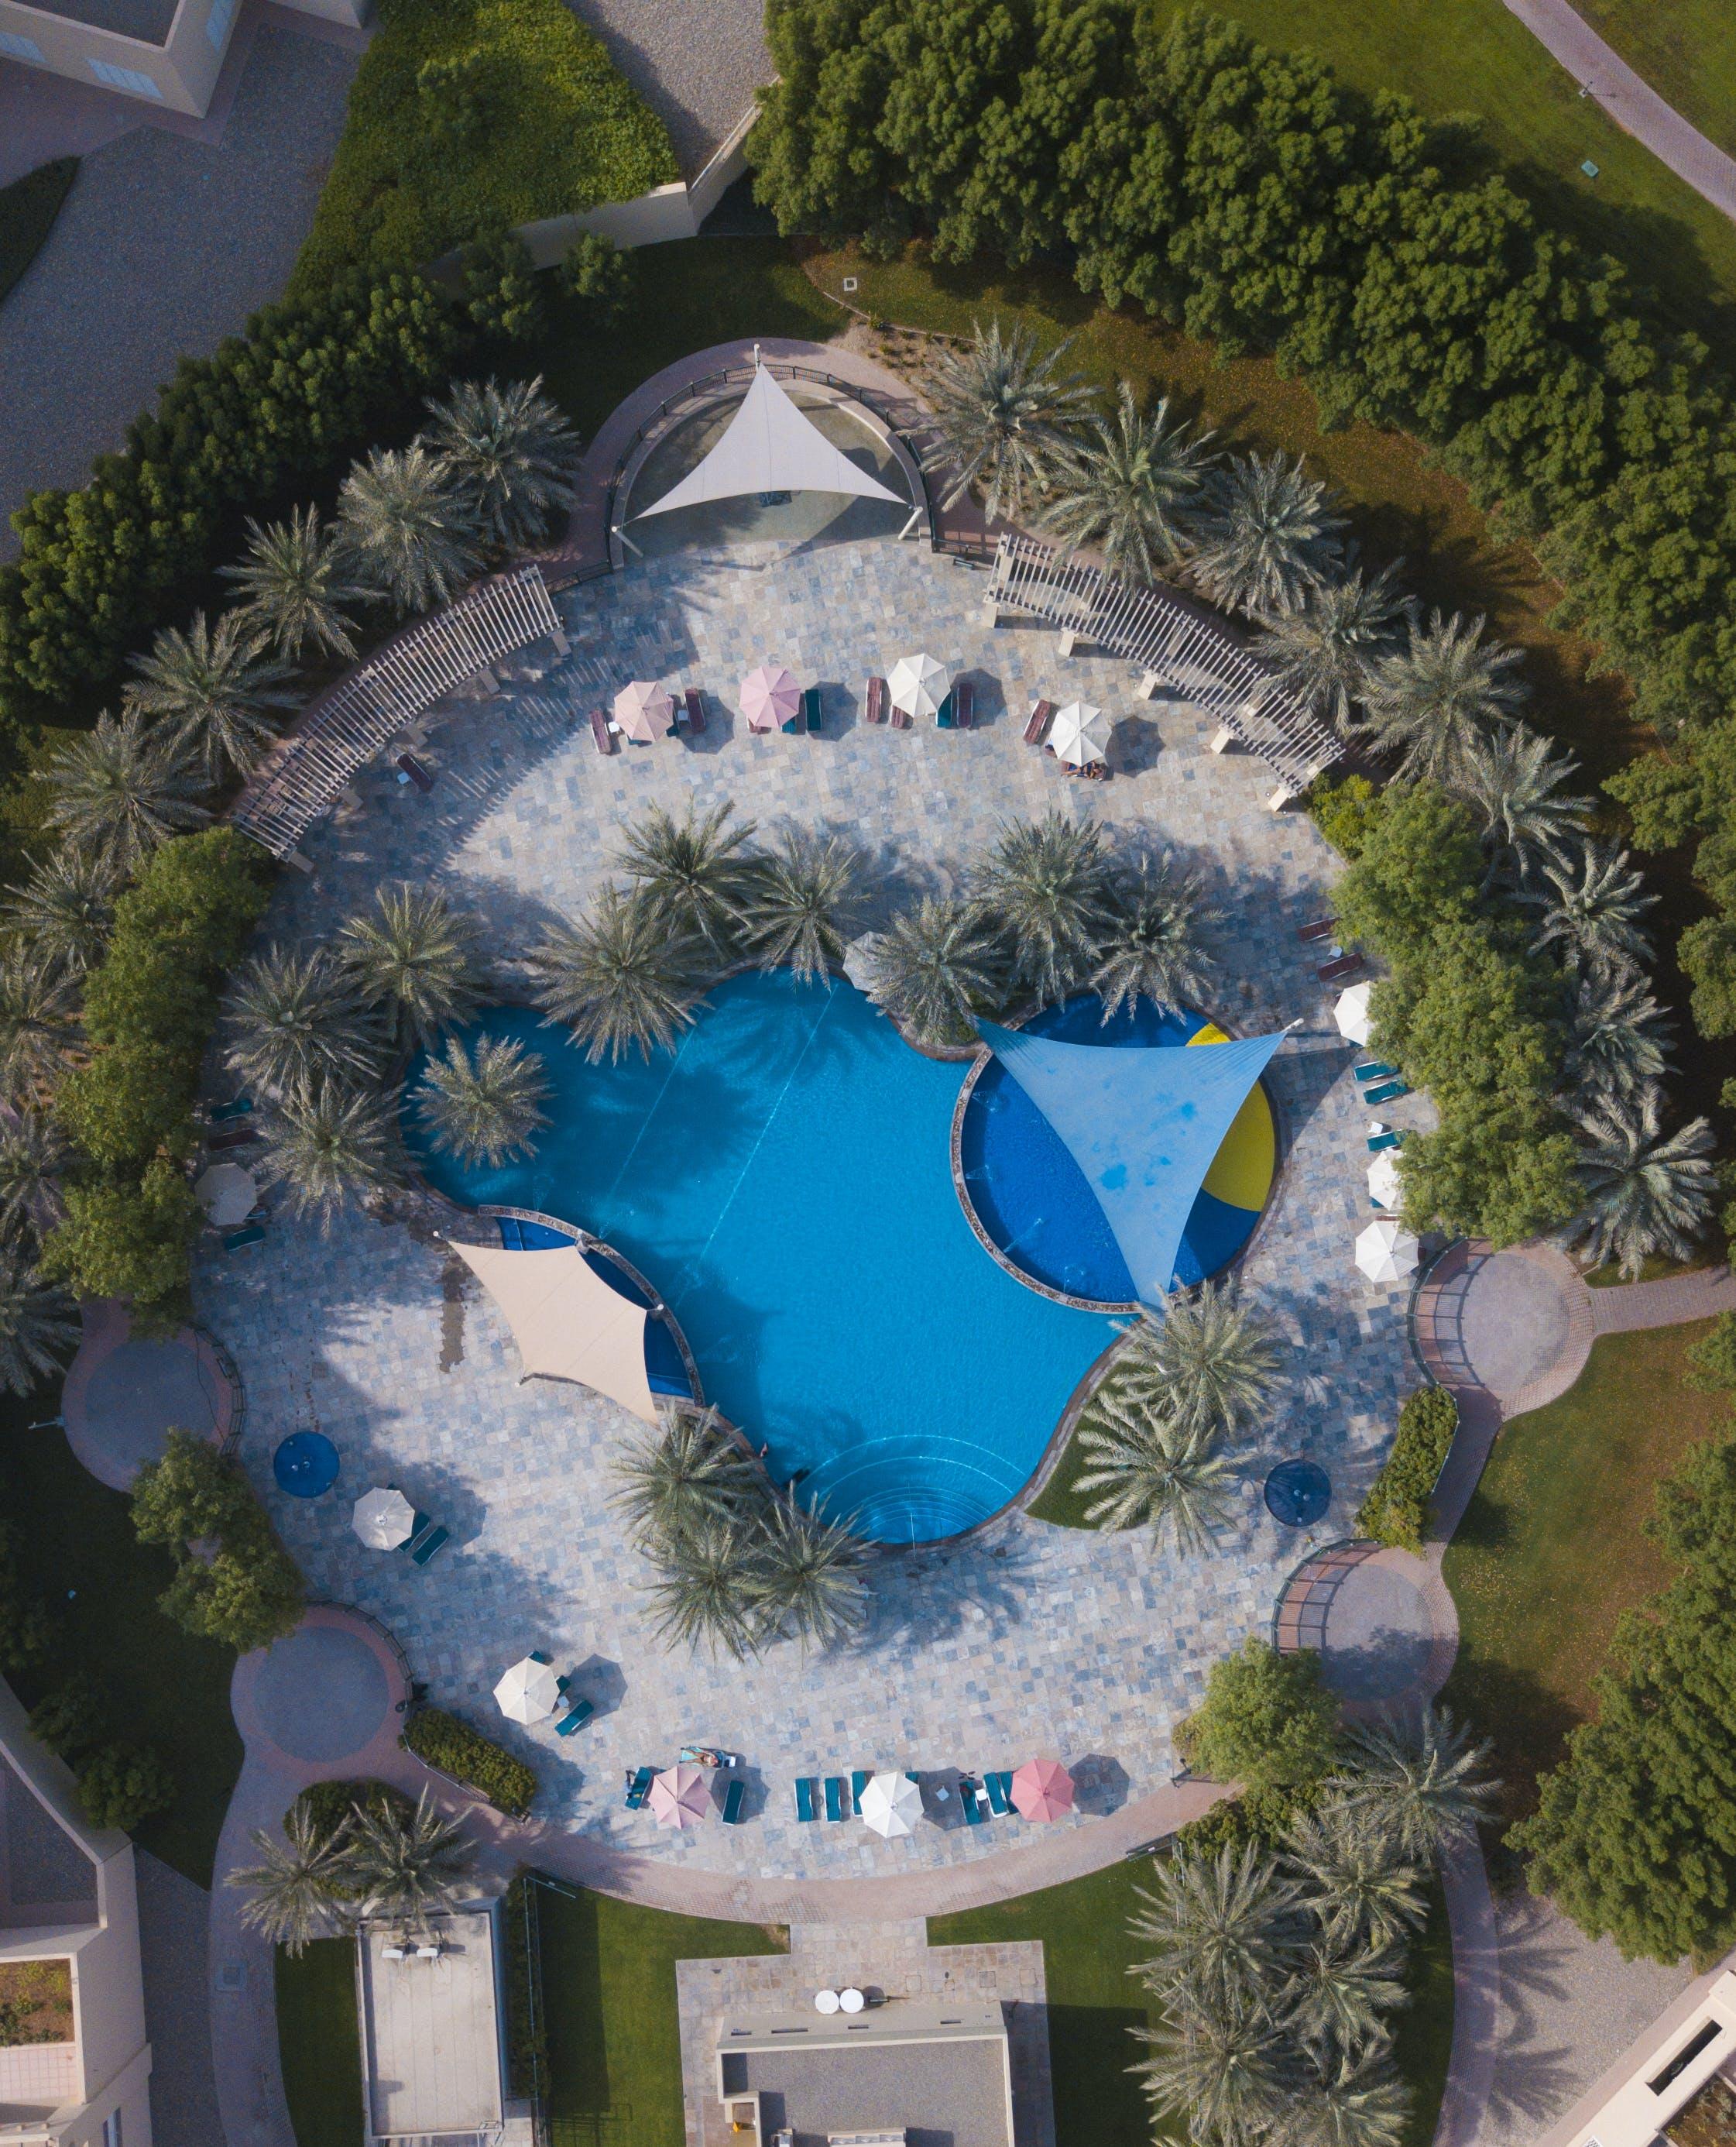 Bird's Eye View Photo of Pool